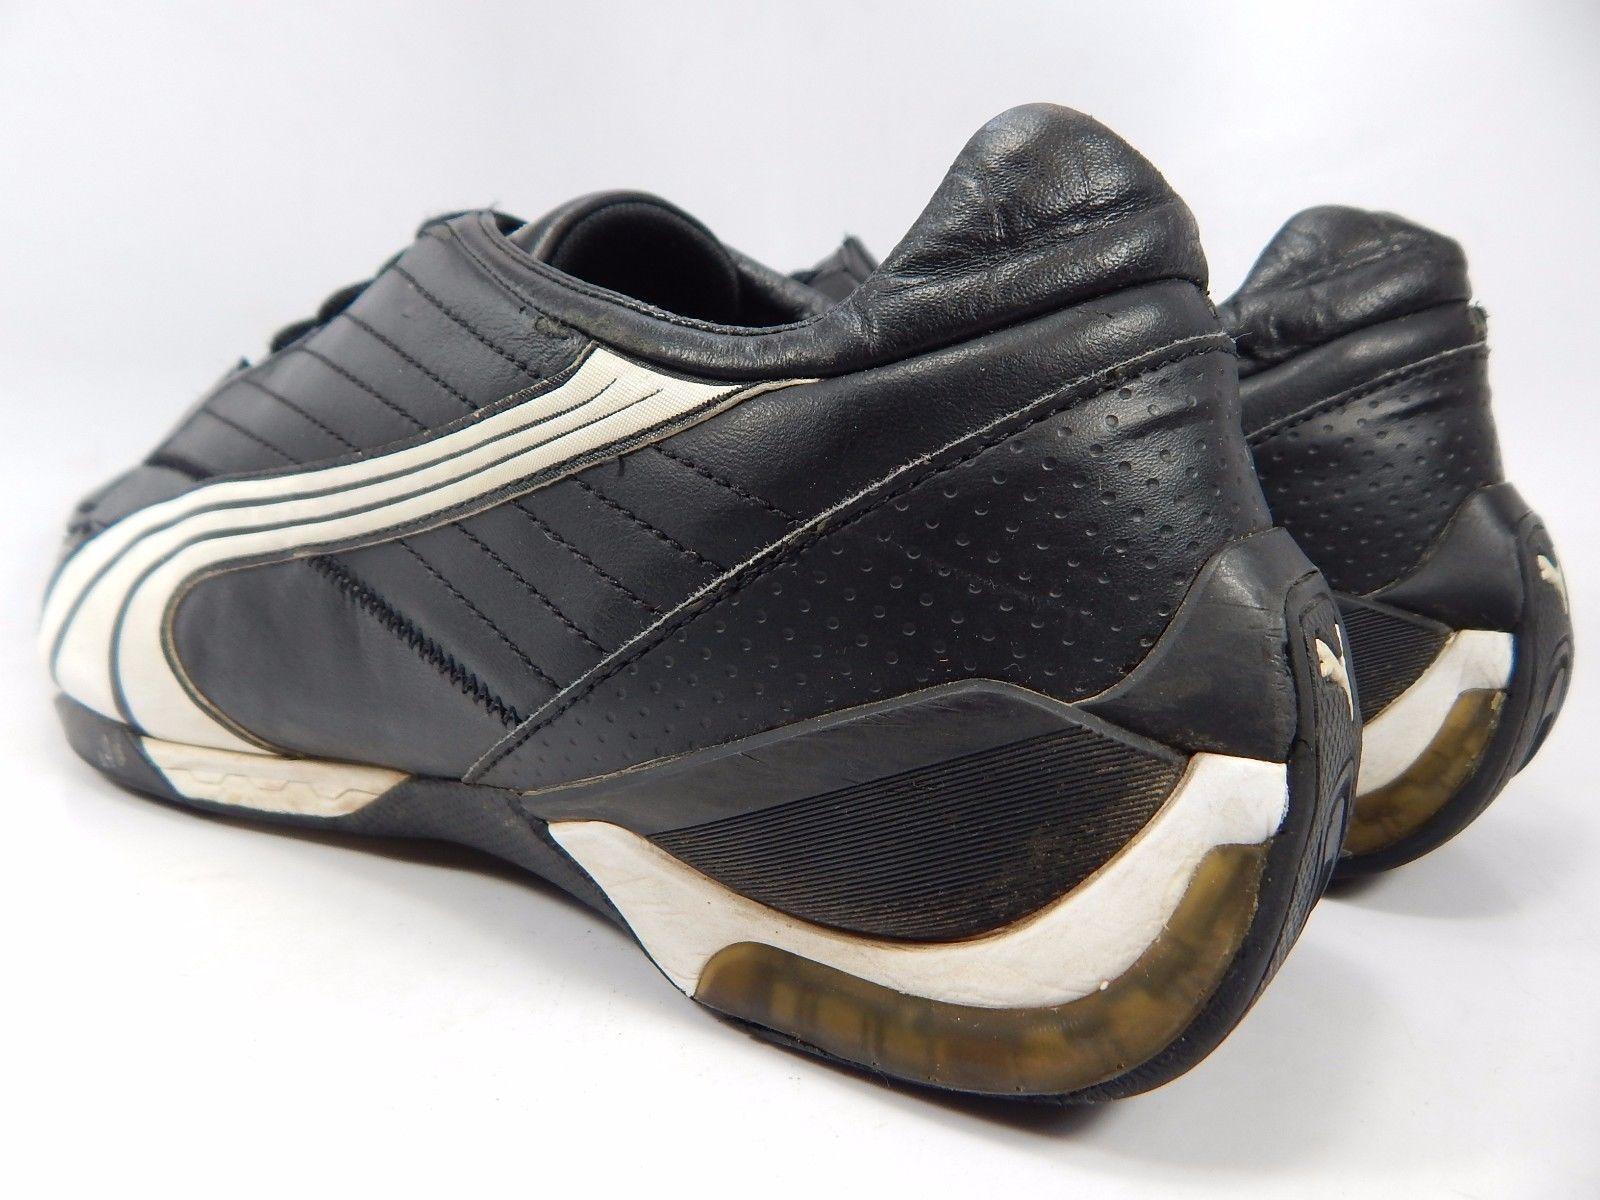 Puma Kart Cat II 2 Men's Leather Driving Shoes Size US 12 M (D) EU 46 Black